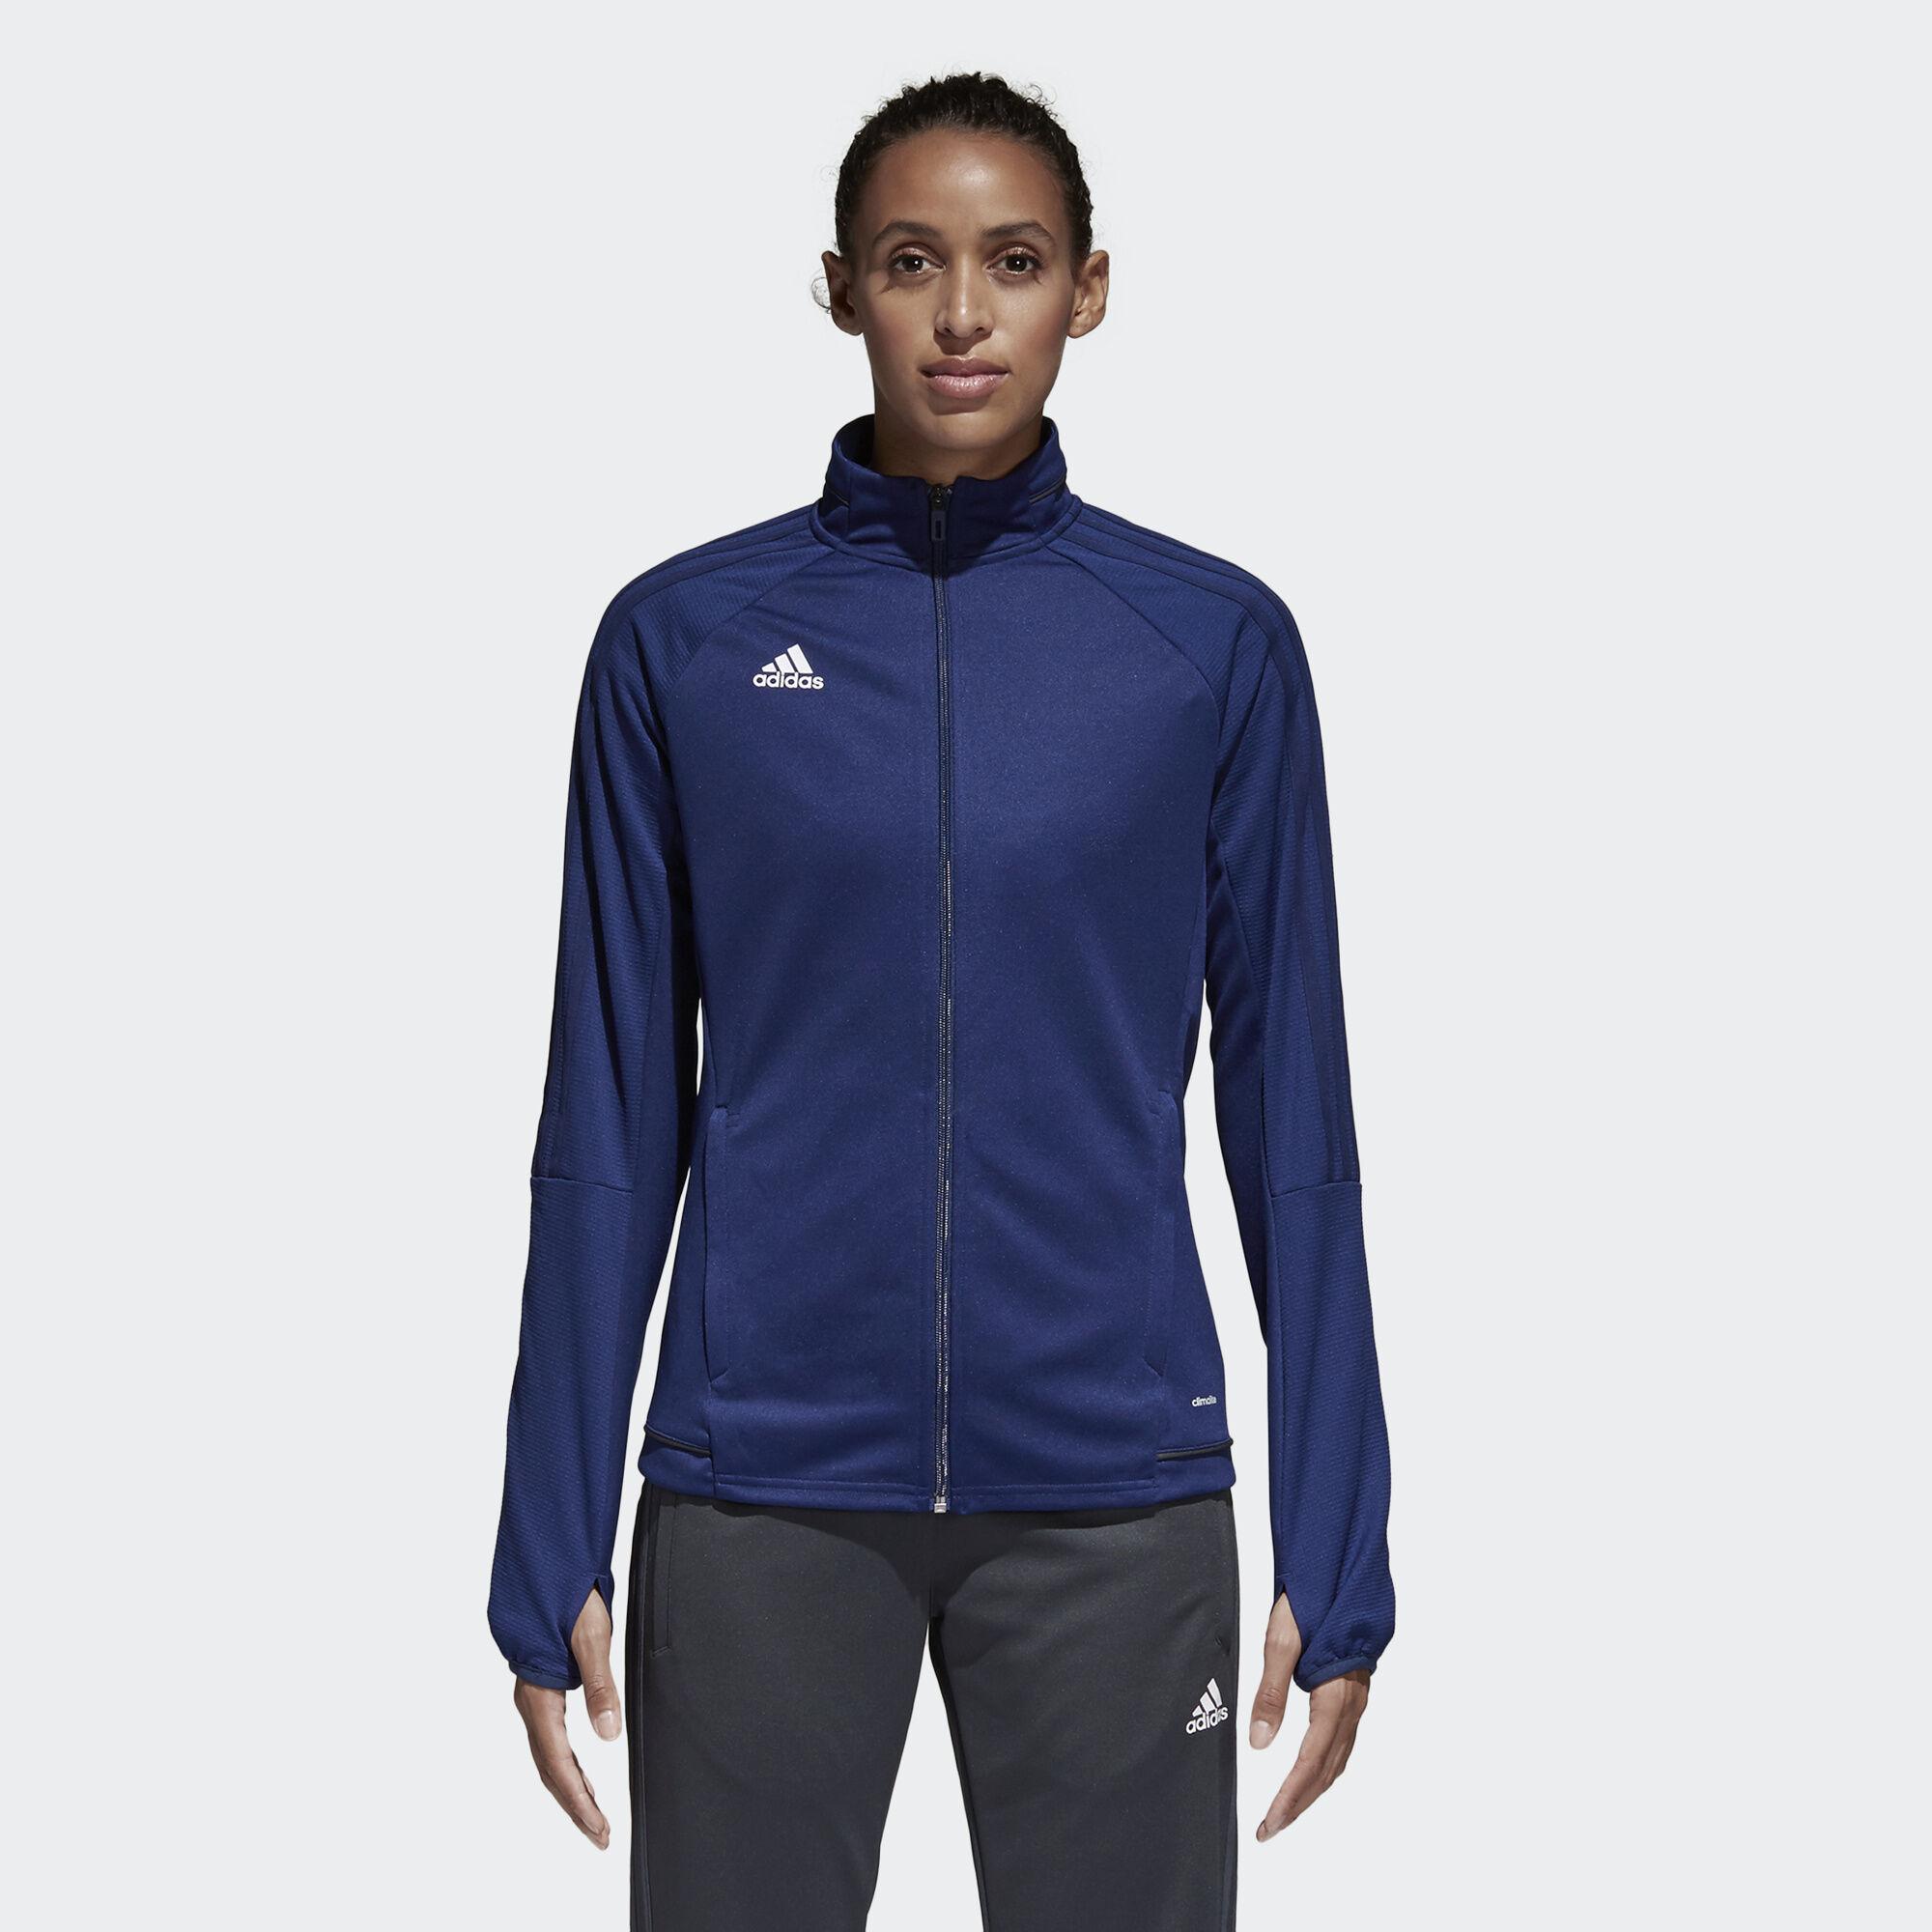 Adidas jacket - Adidas Tiro 17 Training Jacket Blue Dark Shale White Bq8248